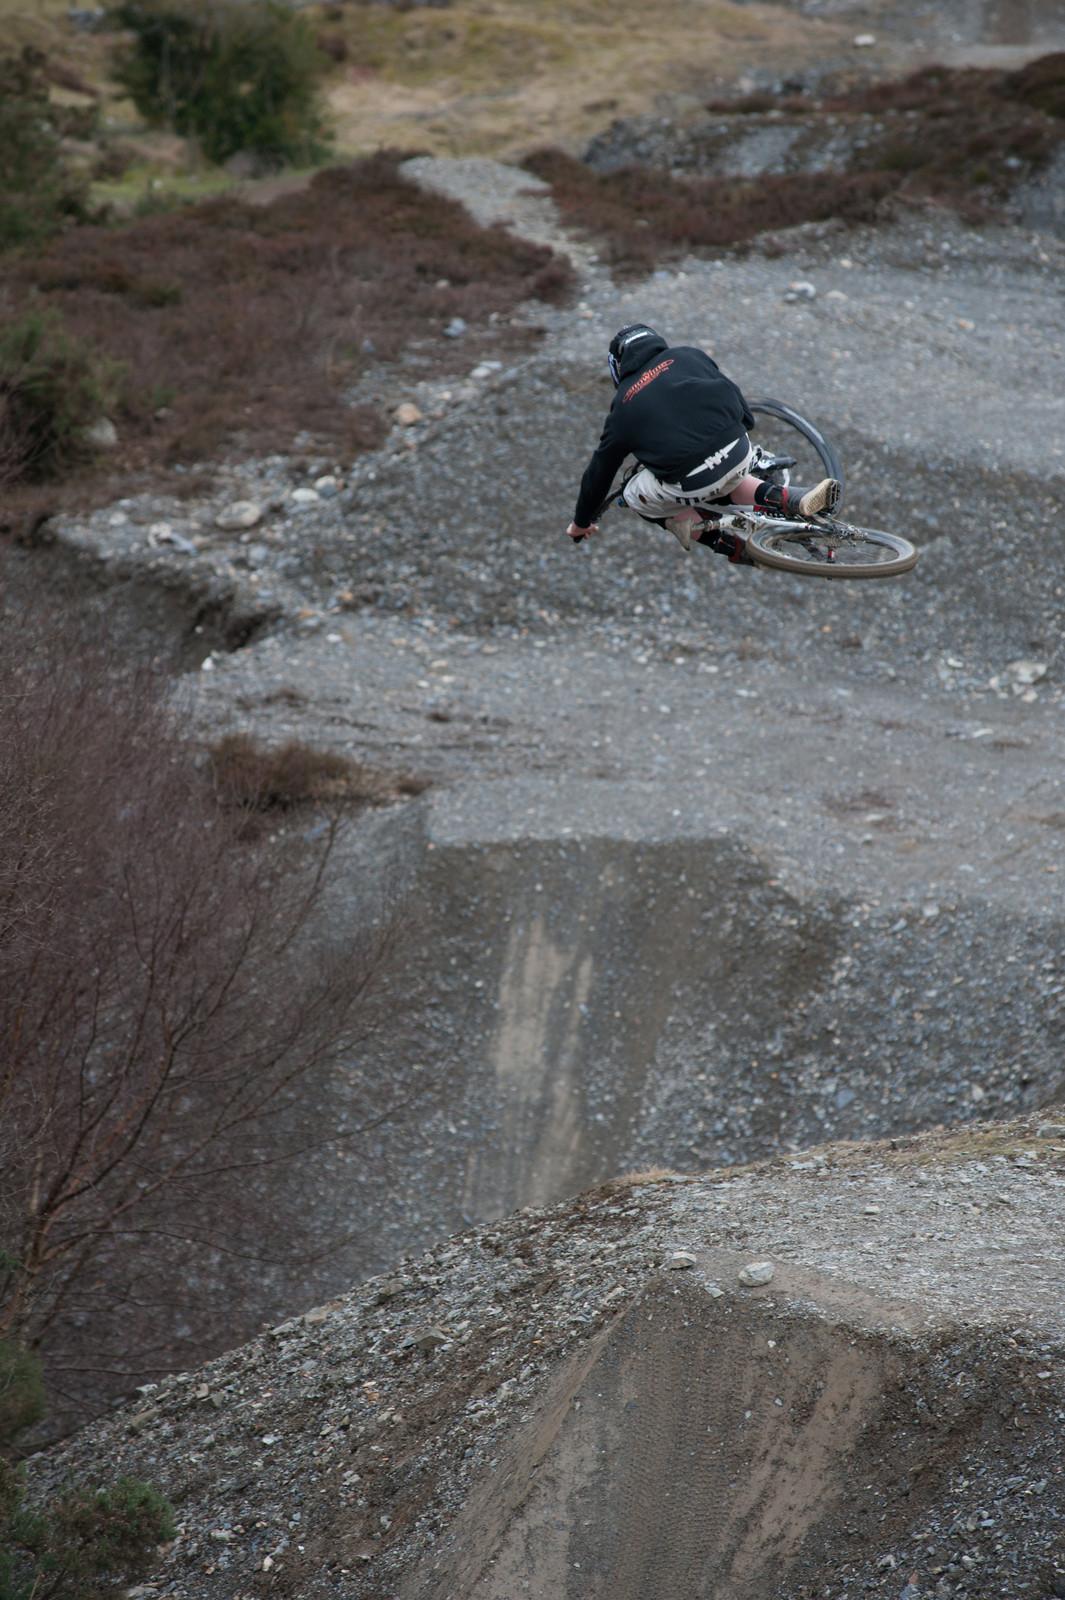 Table at Revolution bike park - Jean-dirt - Mountain Biking Pictures - Vital MTB